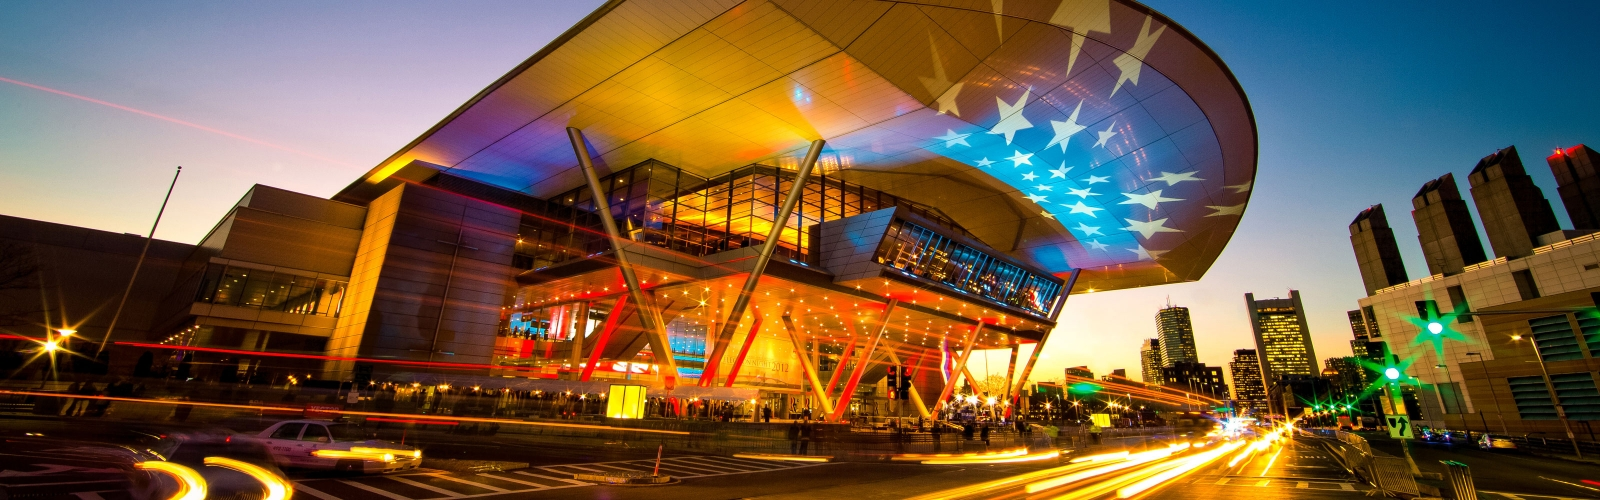 The Boston Convention and Exhibition Center in Boston's Seaport District